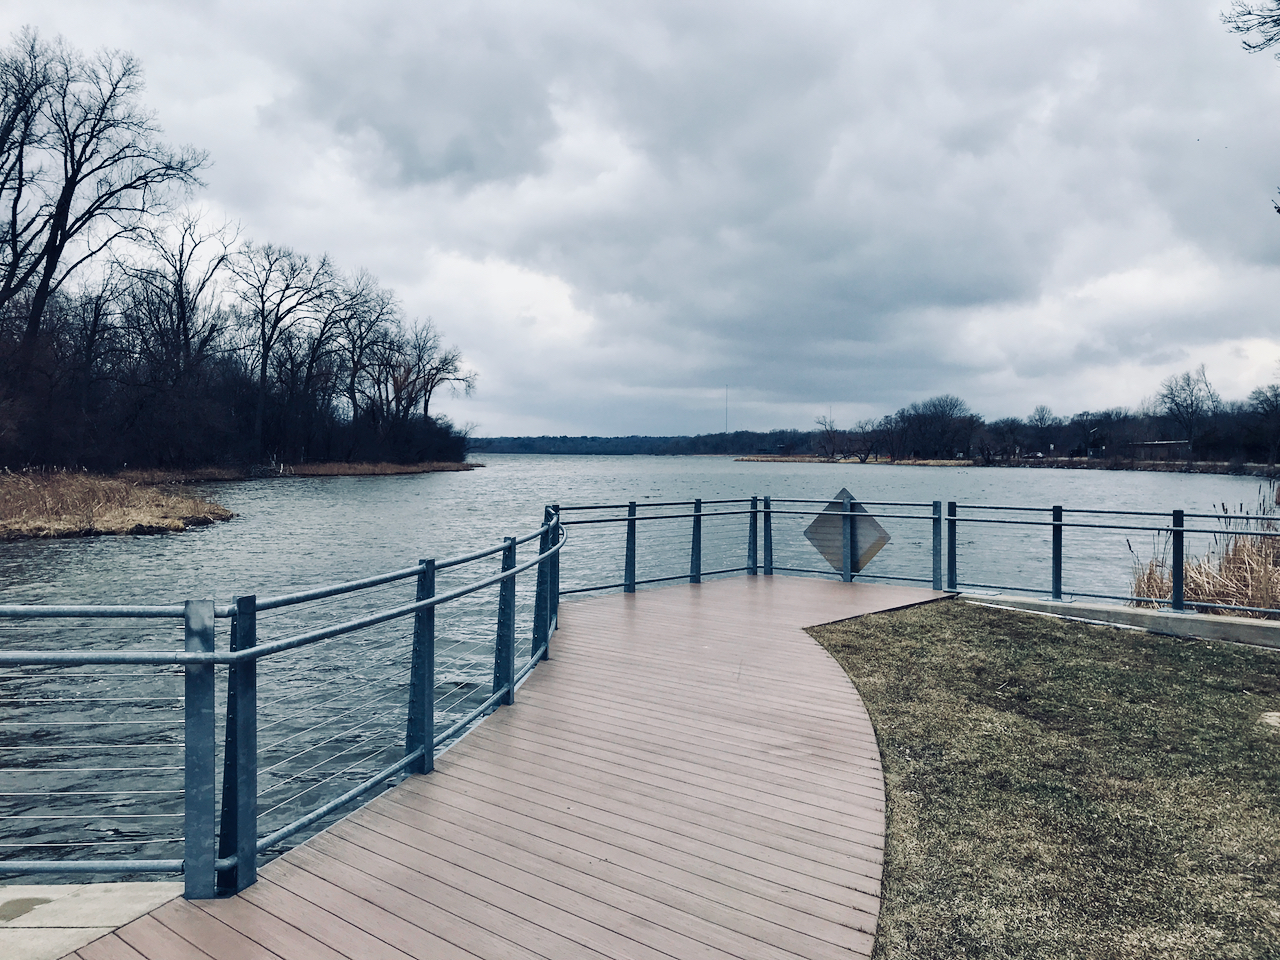 Gray Rails. Lake Wingra. Madison, Wisconsin. March 2018. © William D. Walker